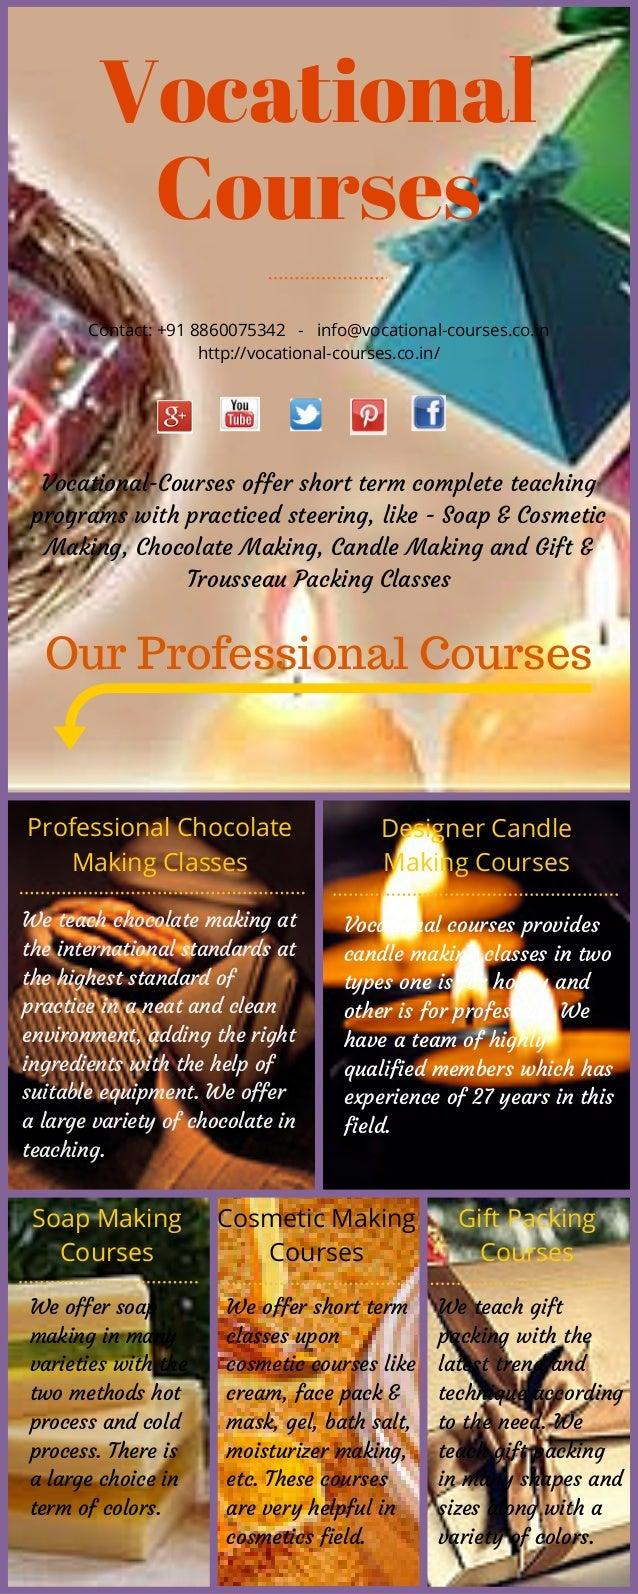 Vocational Courses Contact: +91 8860075342 - info@vocational-courses.co.in http://vocational-courses.co.in/ Vocational-Cou...